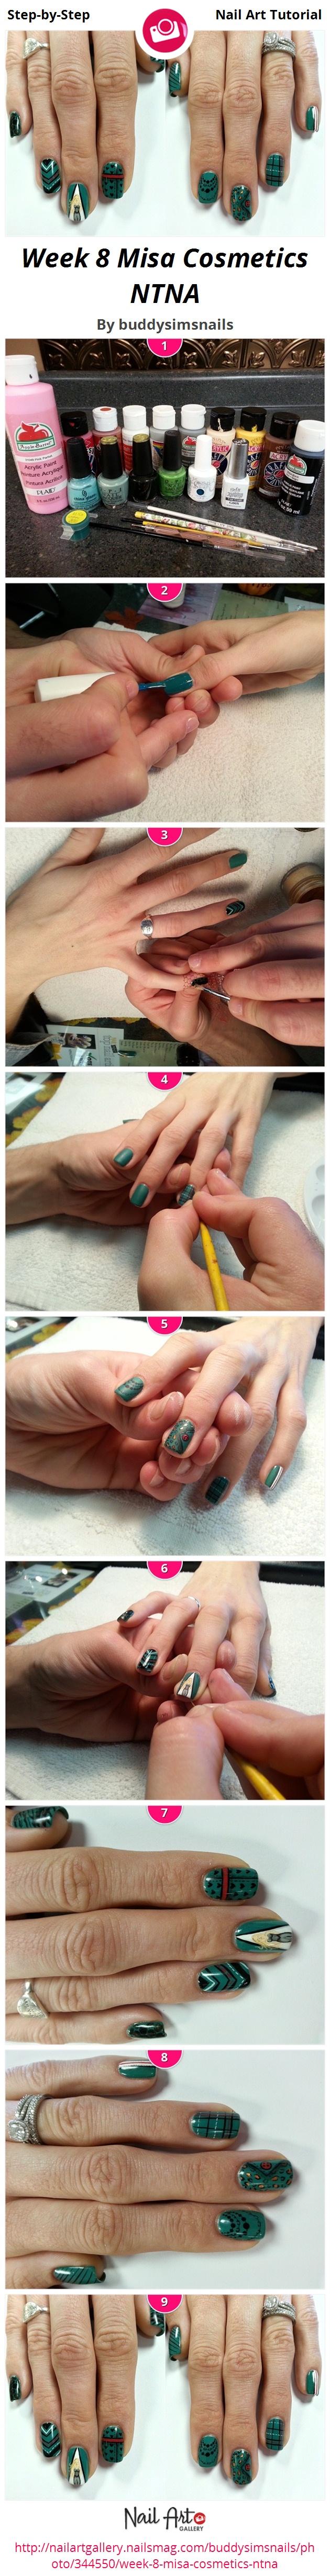 Week 8 Misa Cosmetics NTNA - Nail Art Gallery